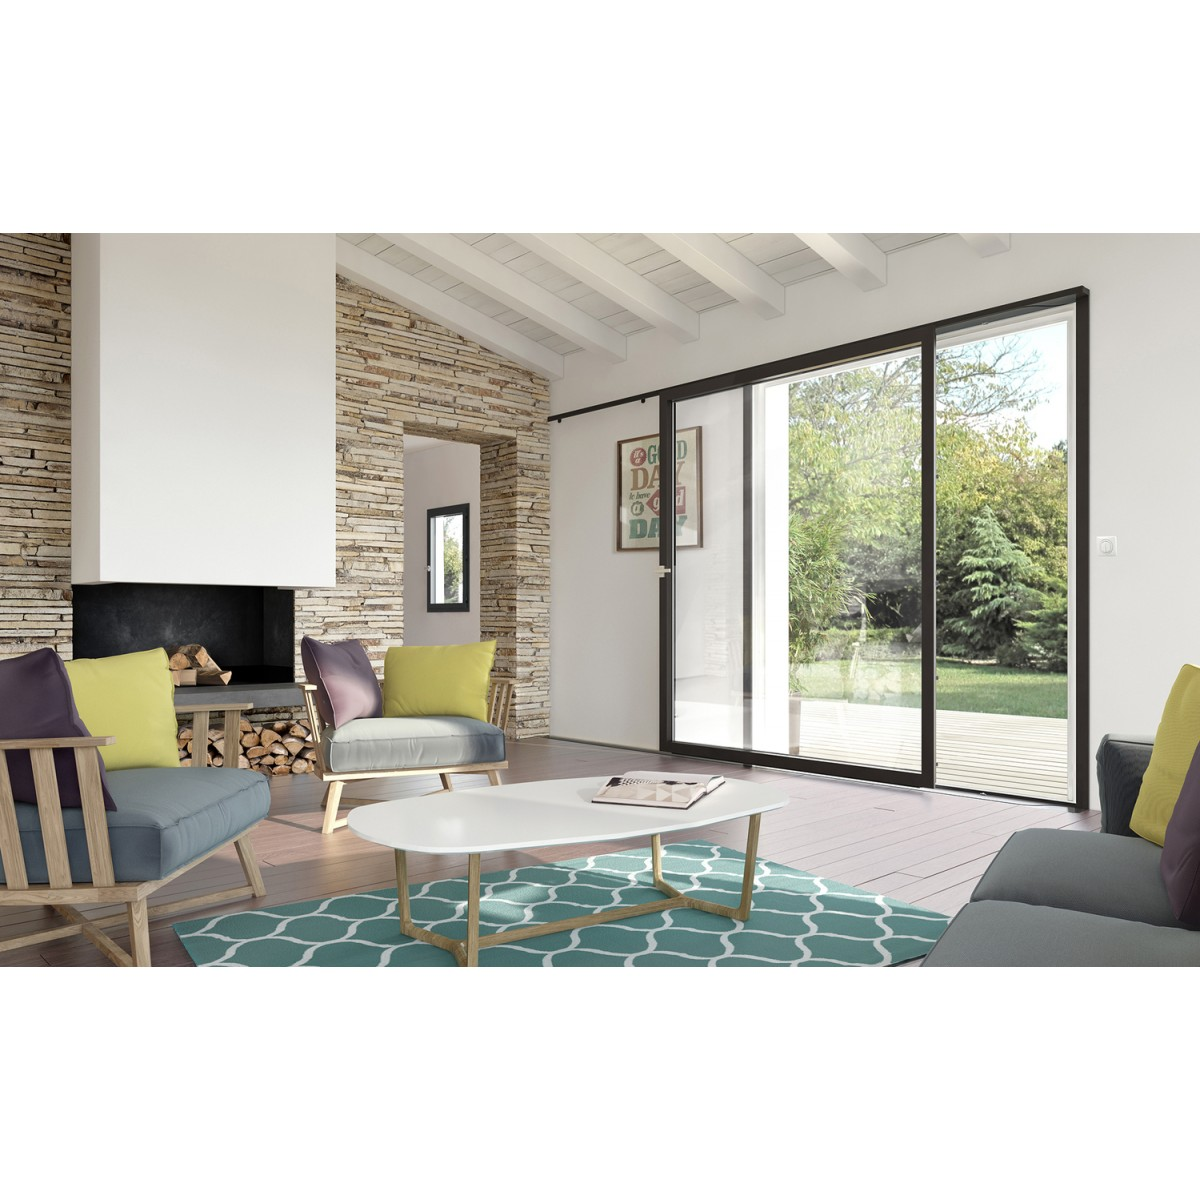 baie coulissante murale alu m3d s l 39 alternative moderne au. Black Bedroom Furniture Sets. Home Design Ideas